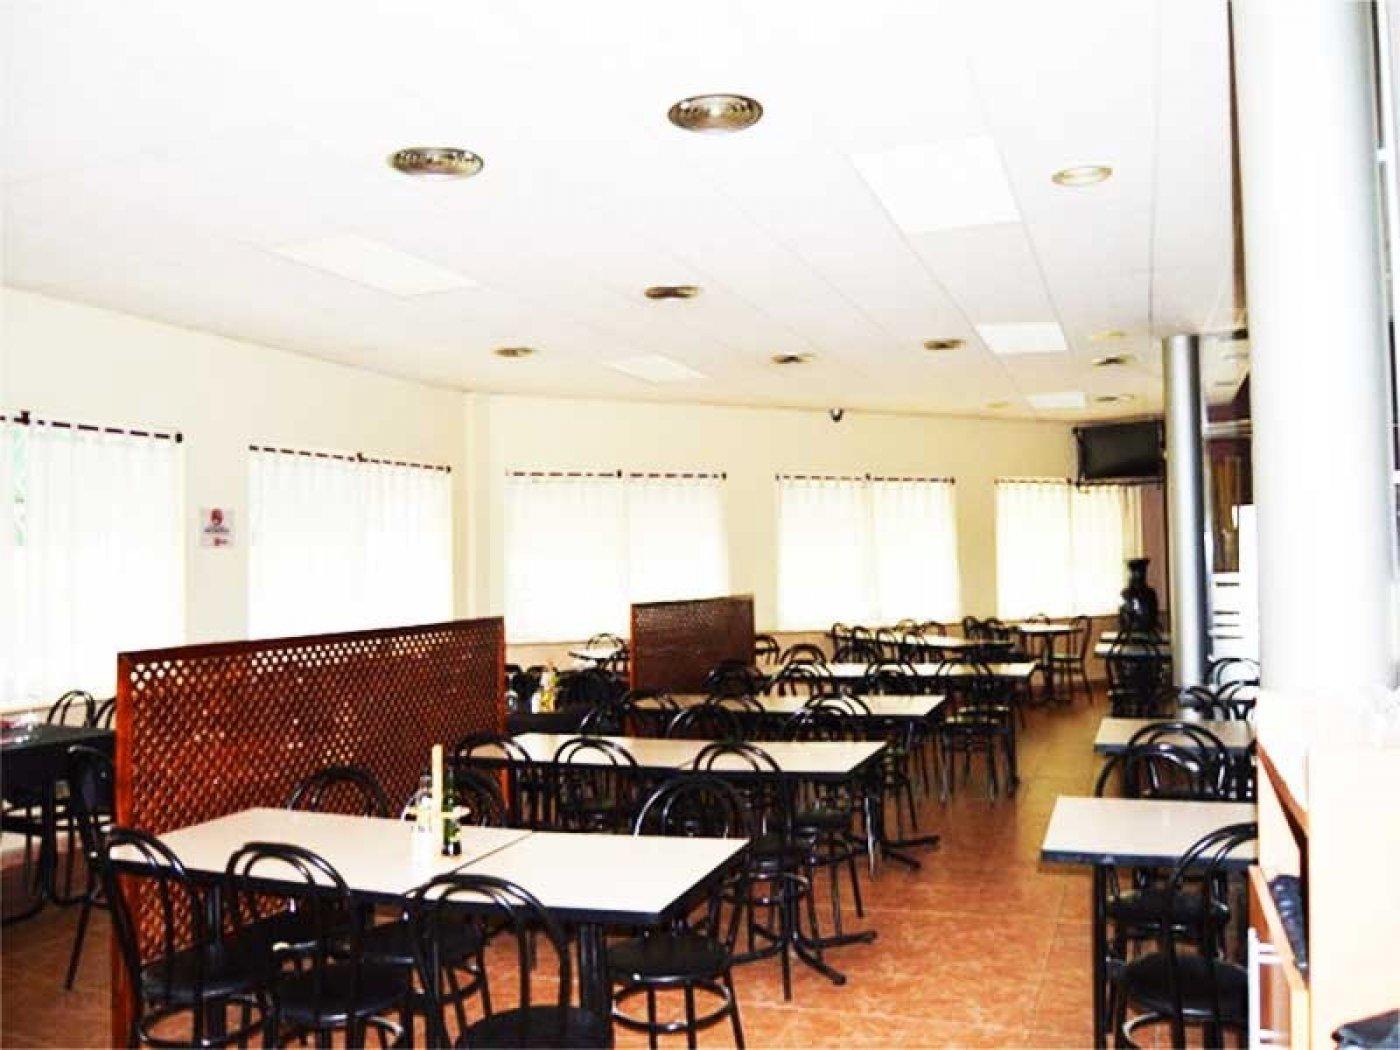 Nave restaurante en polígono cerca de sant sadurní d´anoia - imagenInmueble10